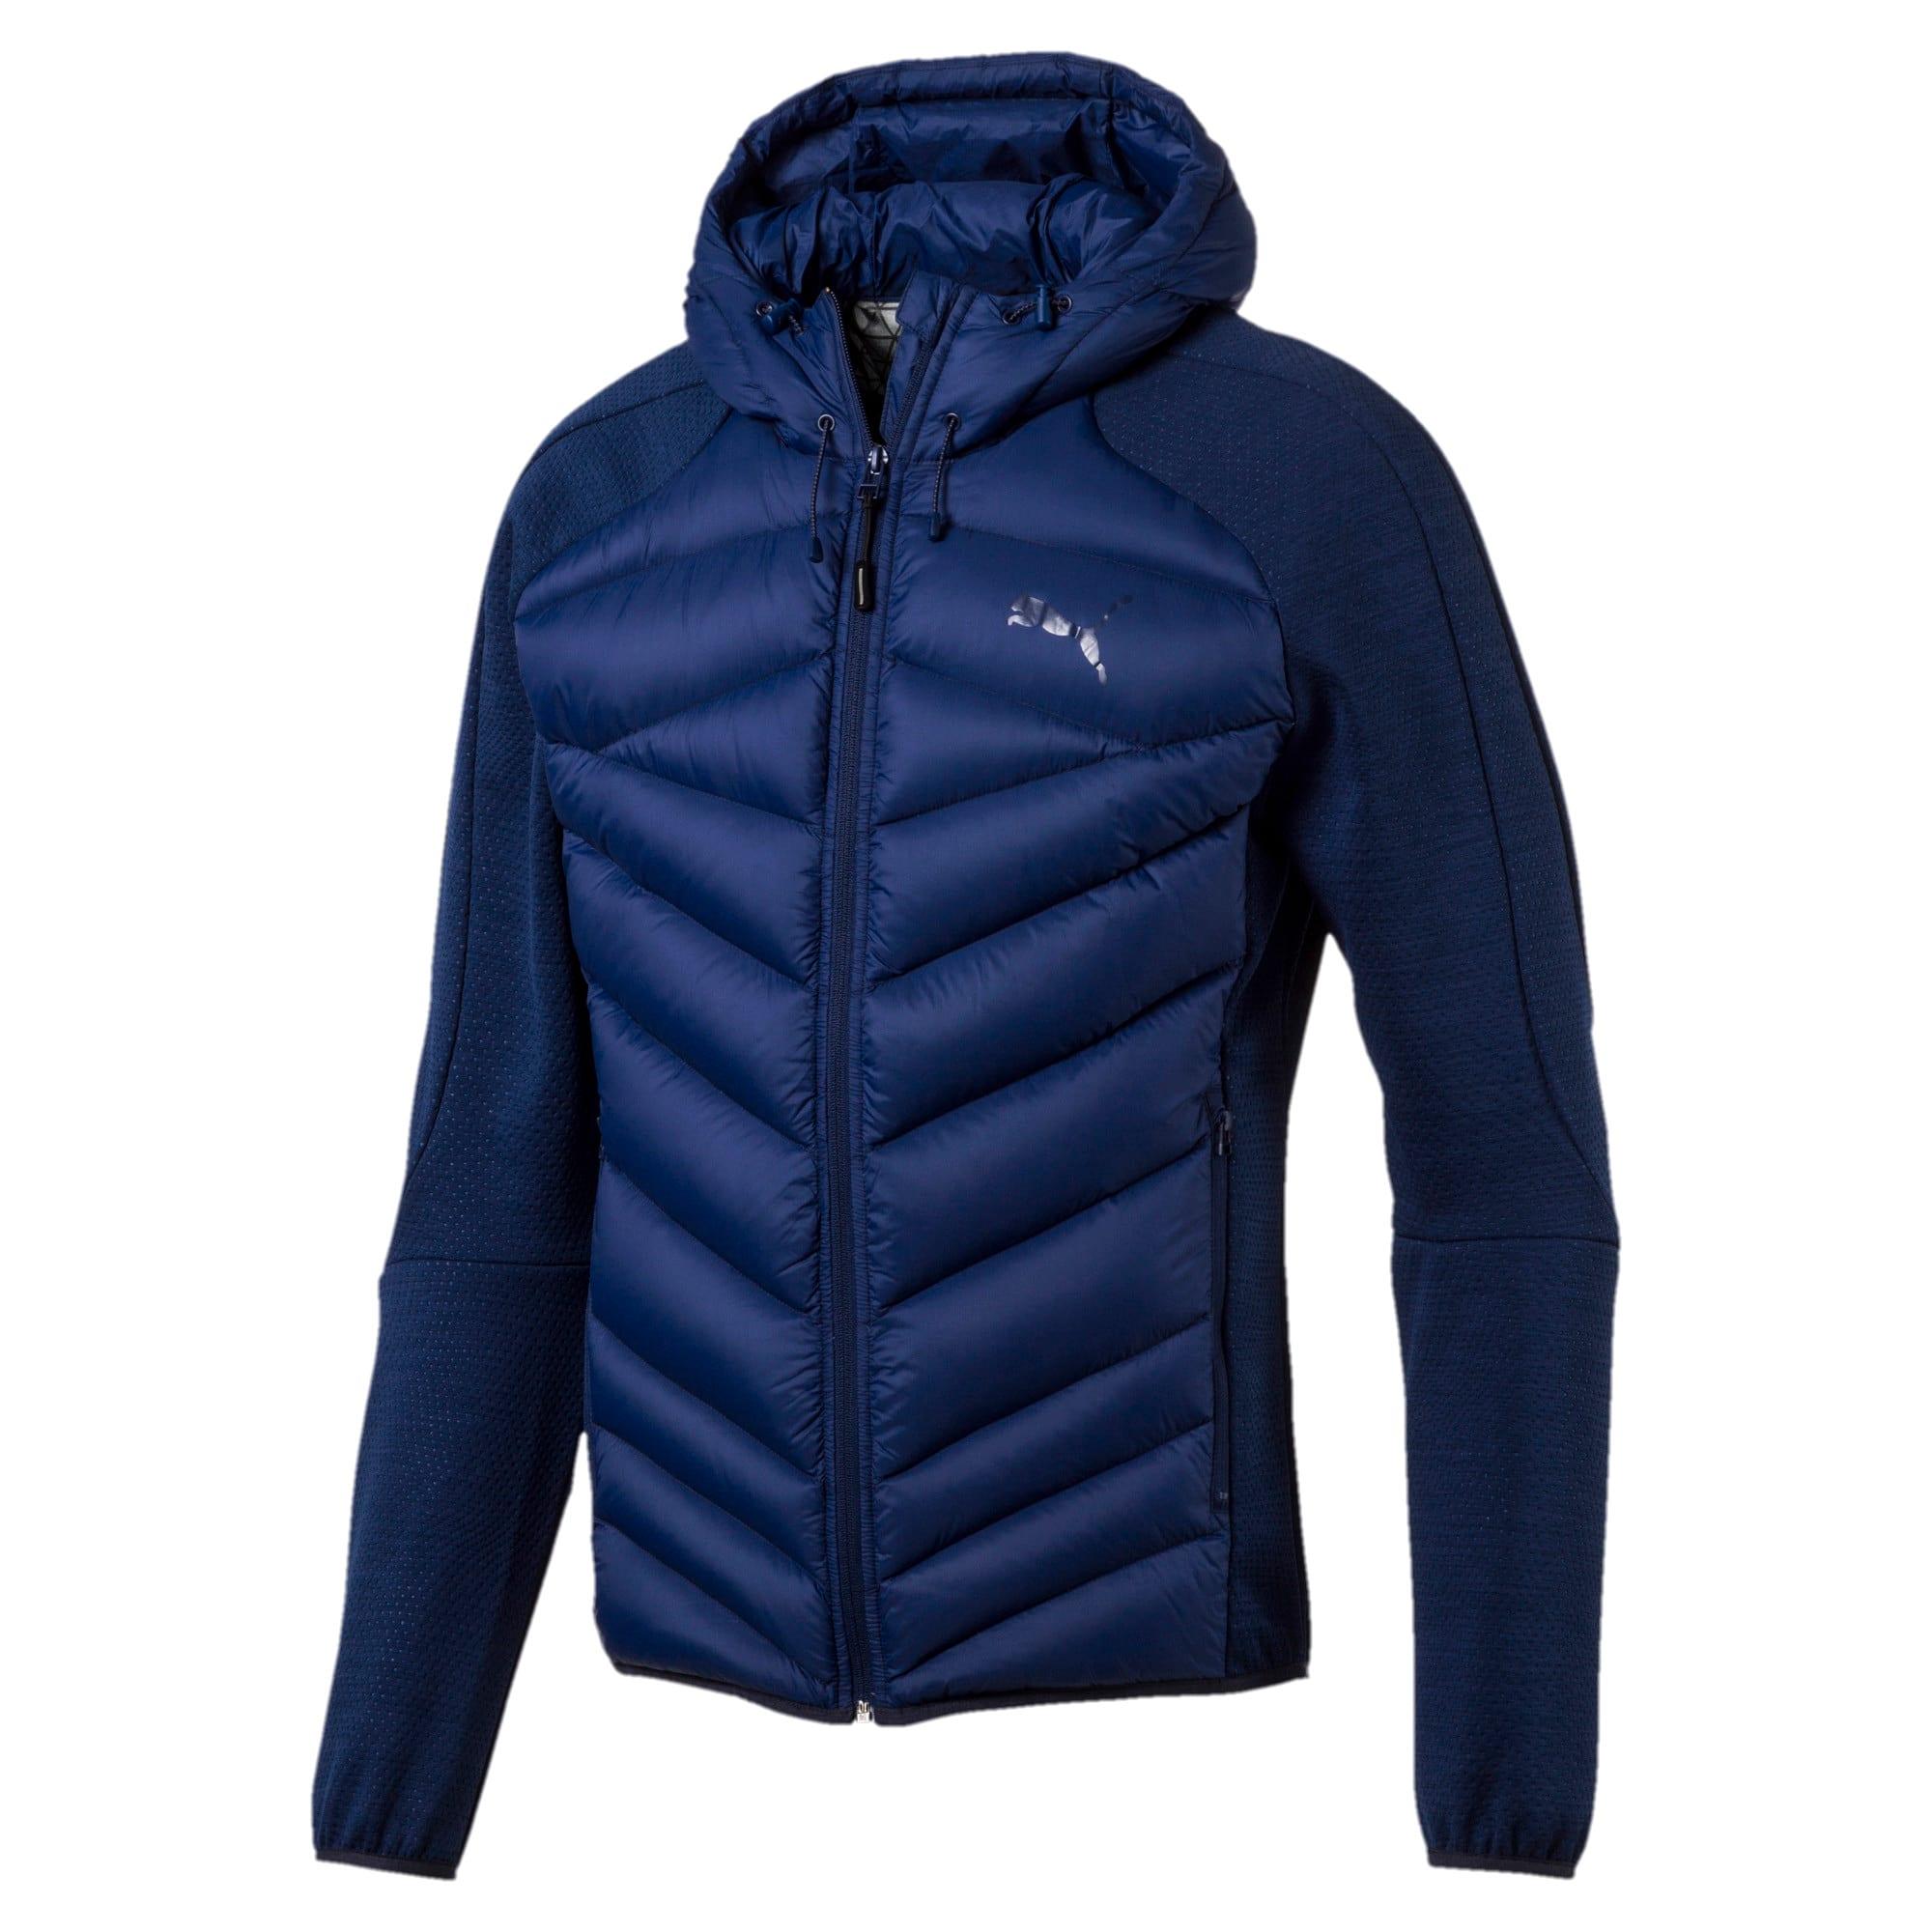 Thumbnail 1 of Double Knit Hybrid 600 Down Men's Jacket, Blue Heather-Blue Depths, medium-IND